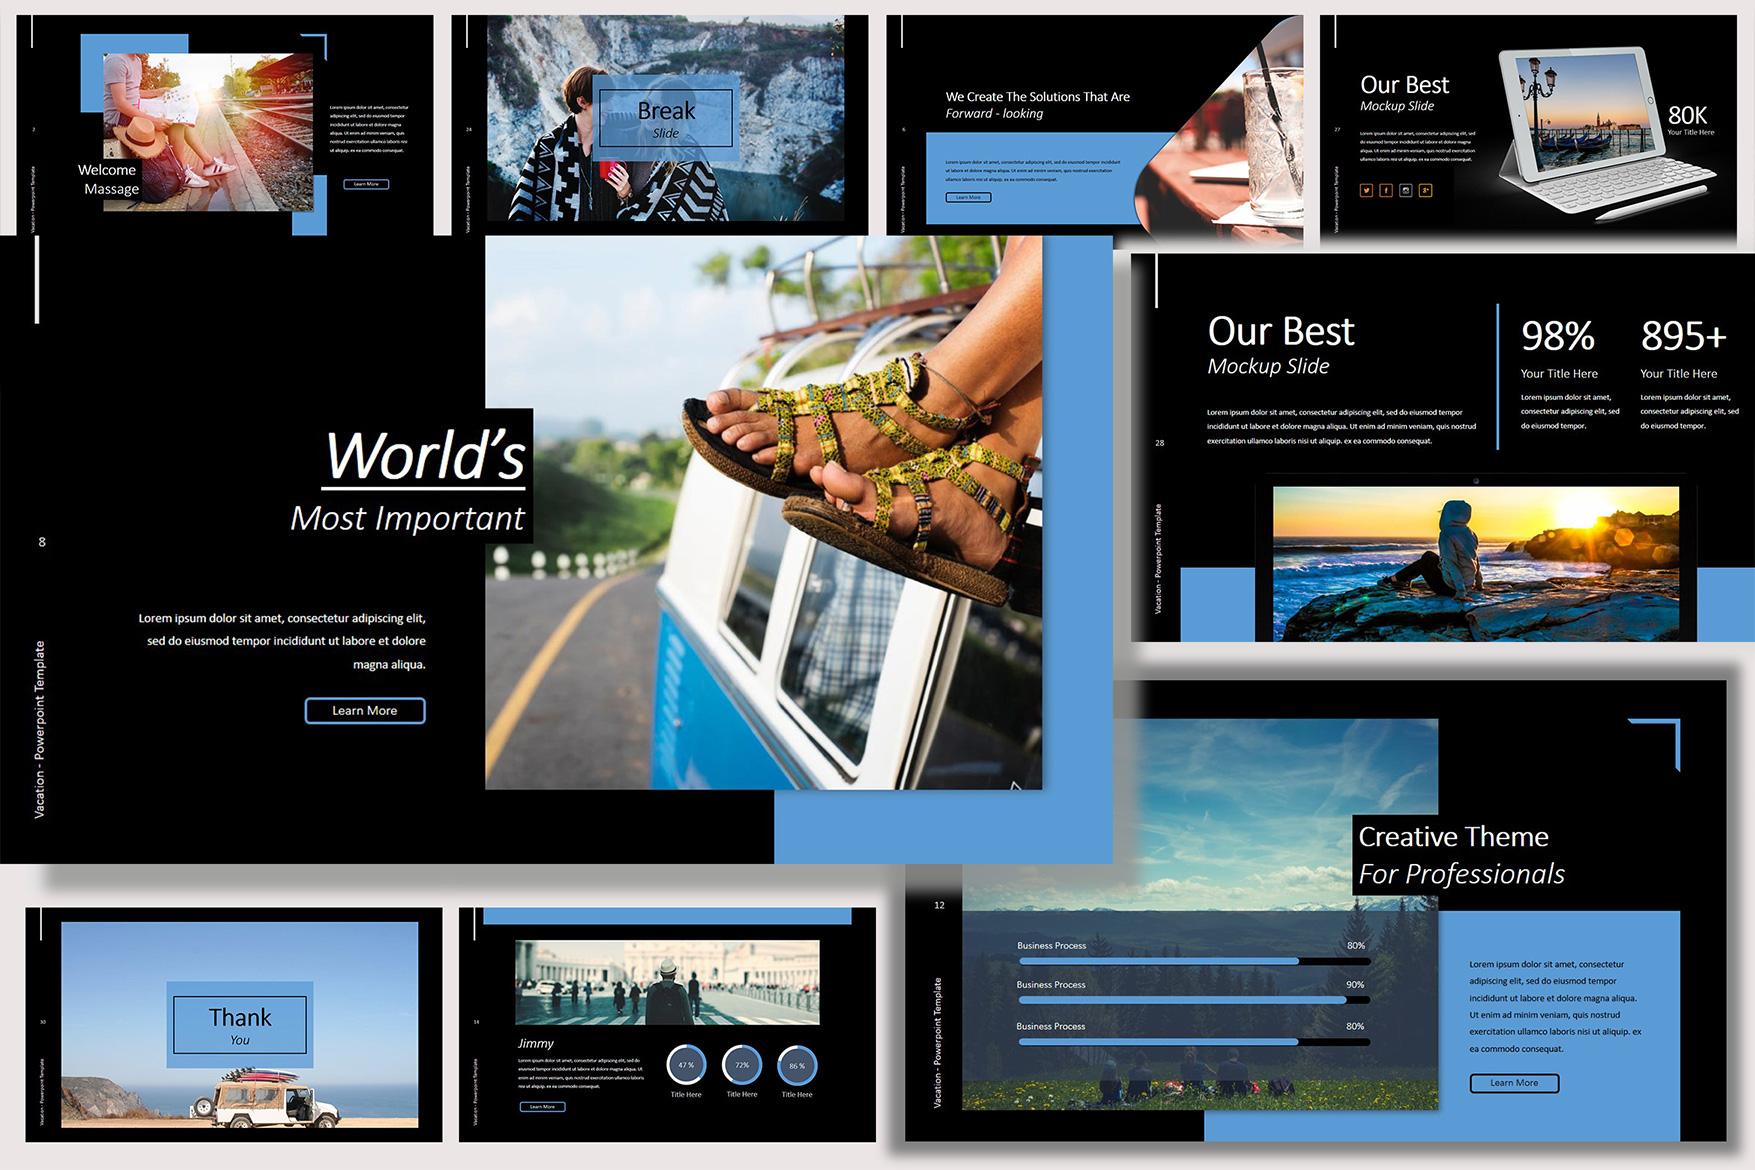 Vacation Lookbook Dark Google Slides Presentation example image 8